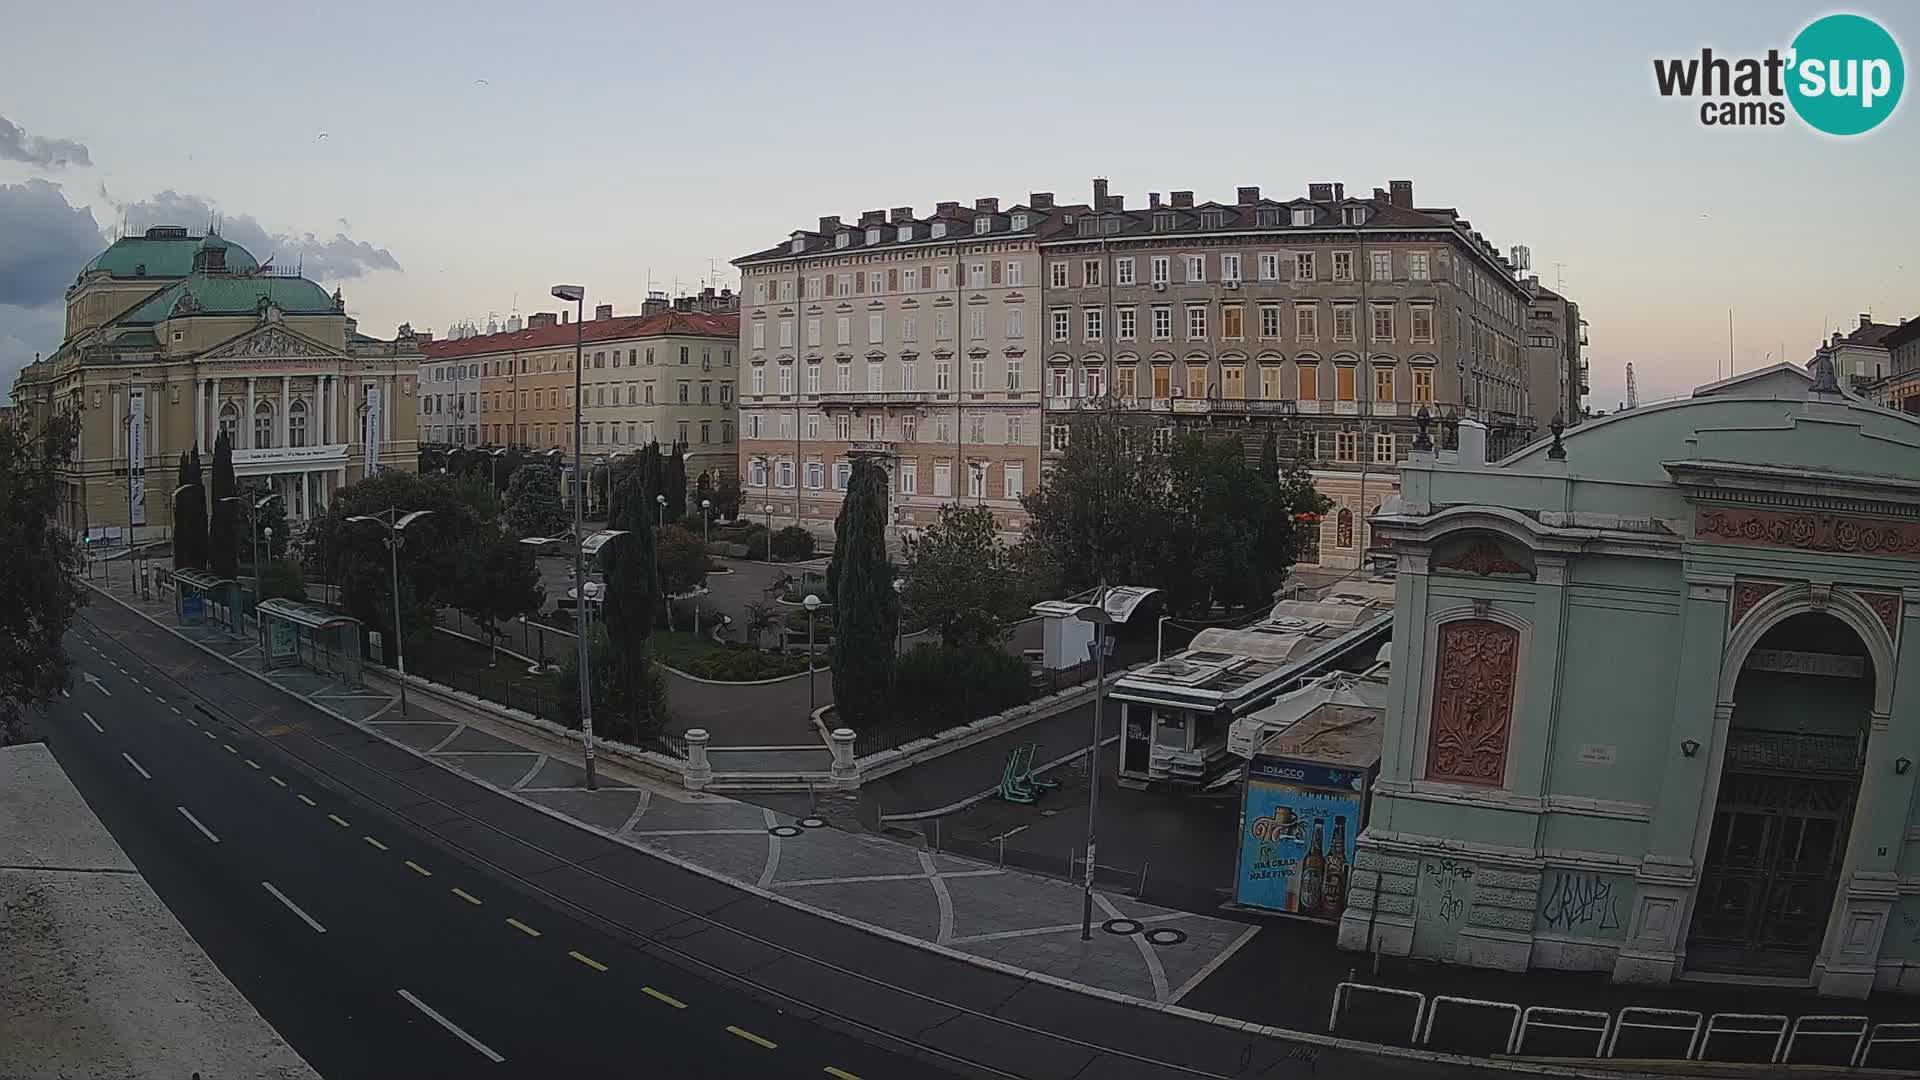 Webcam Rijeka – Parque i Teatro Nacional Croato Ivan pl. Zajc